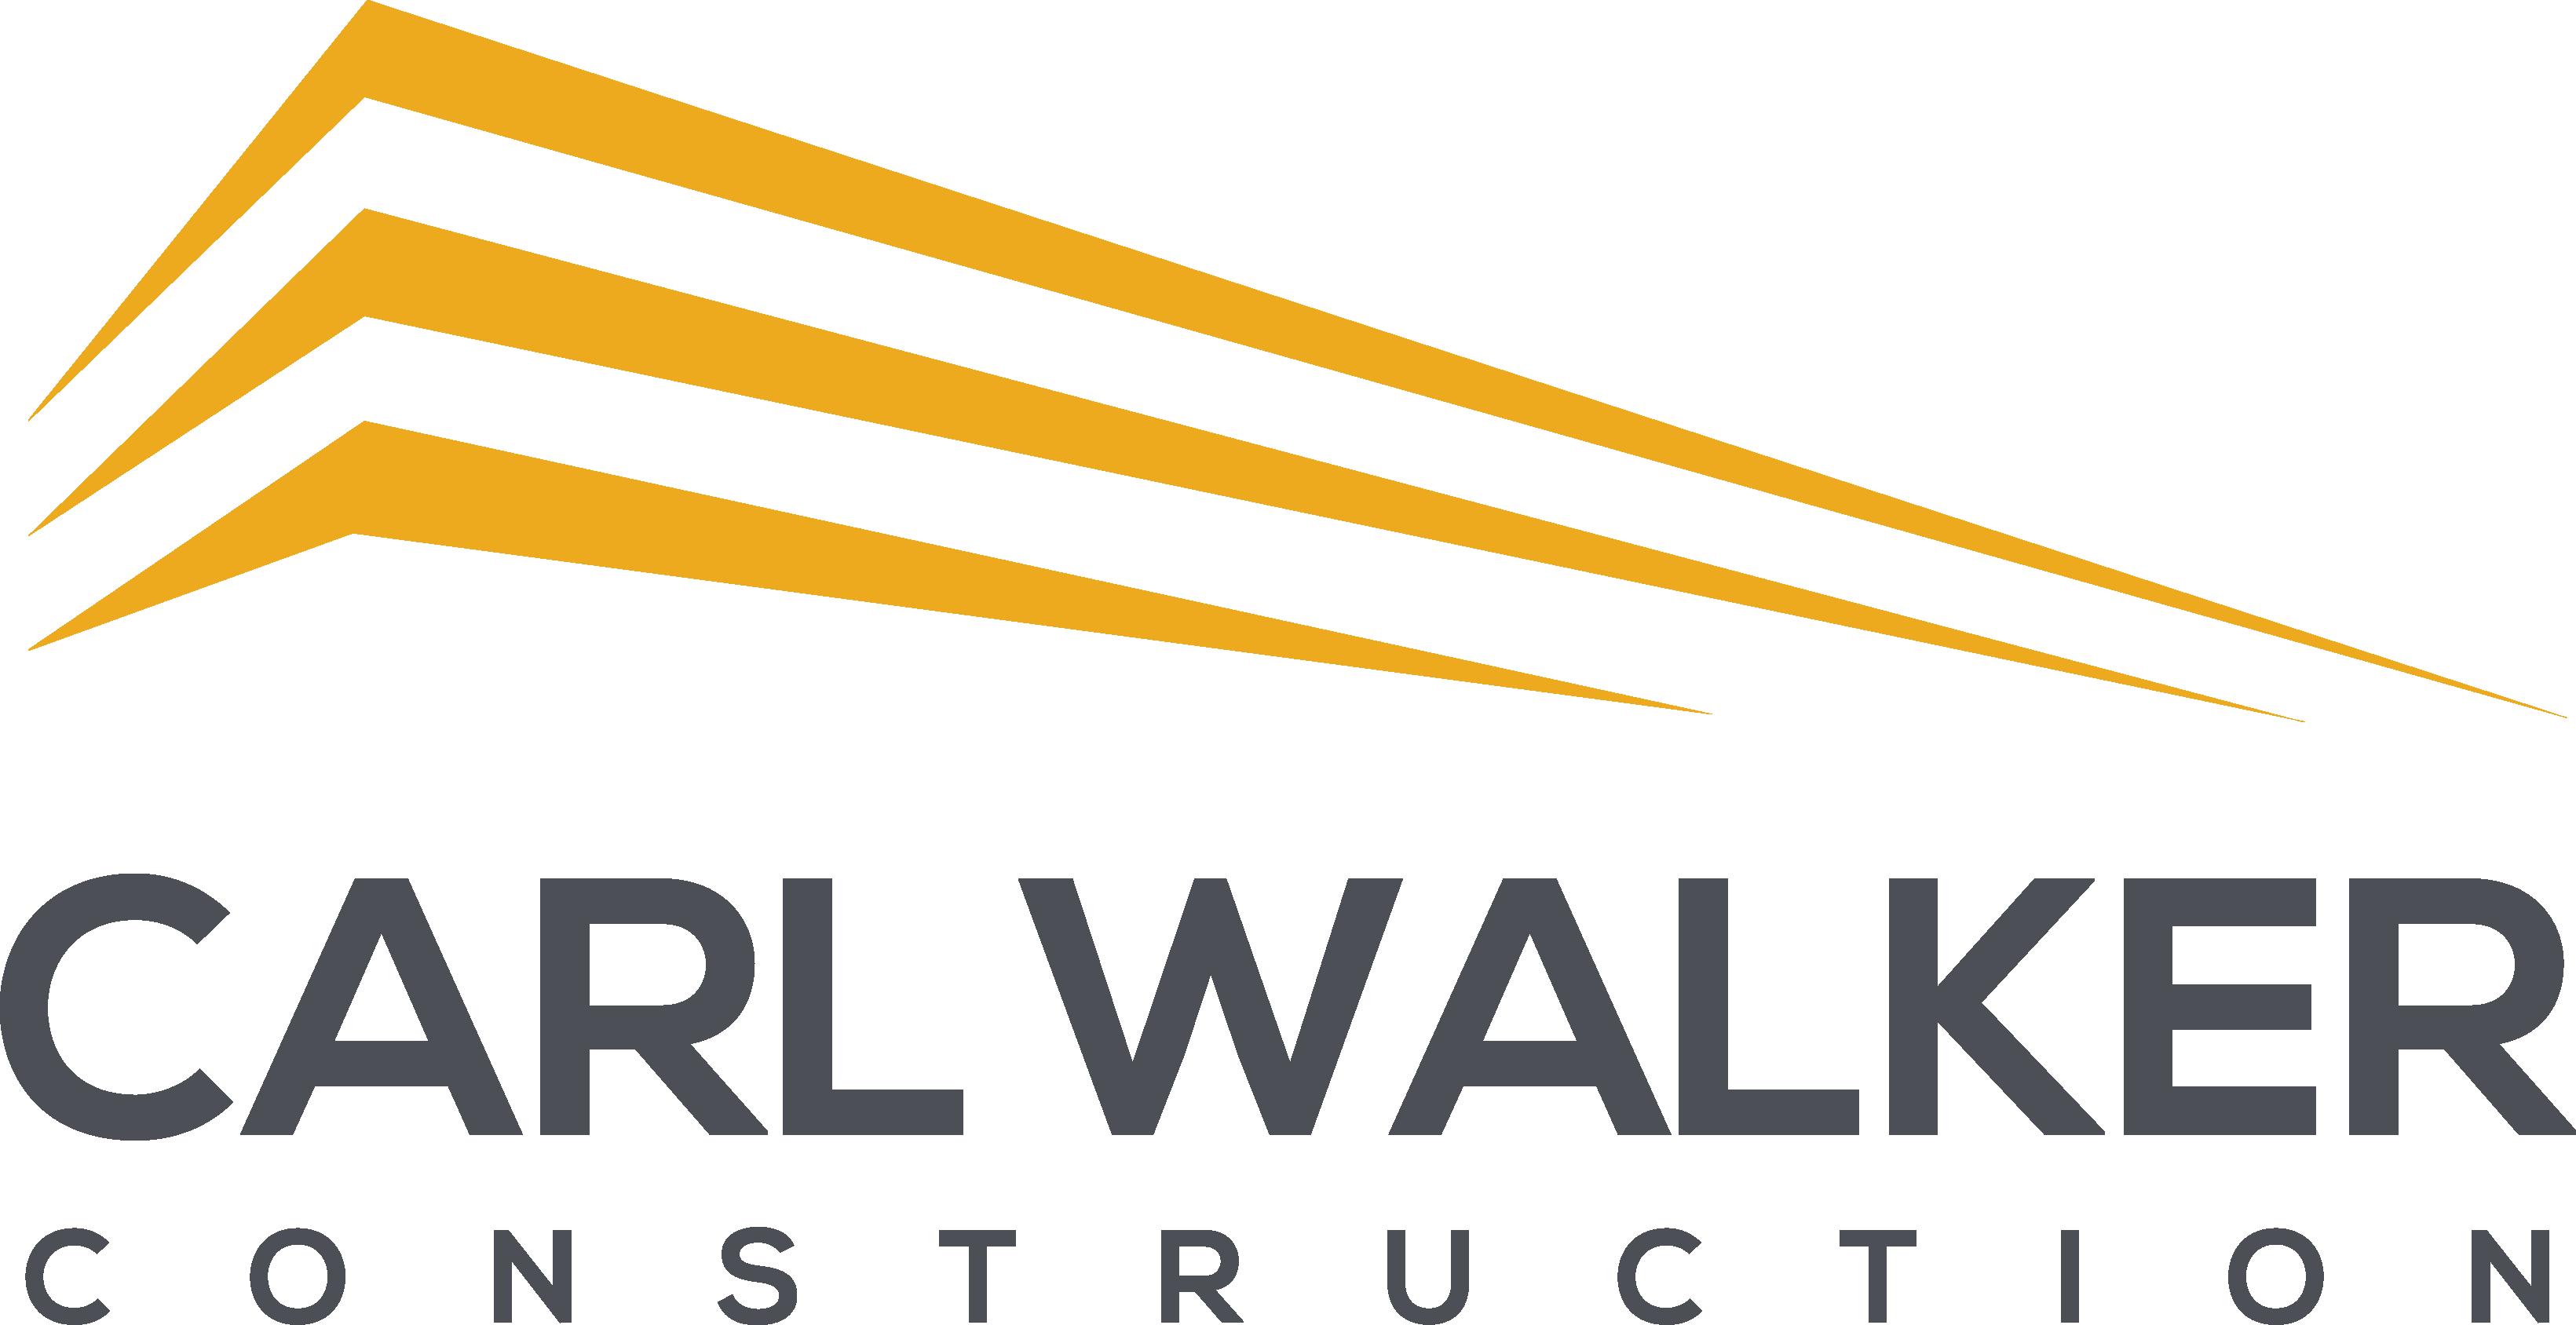 Carl walker New Logo 2 Color, PNG